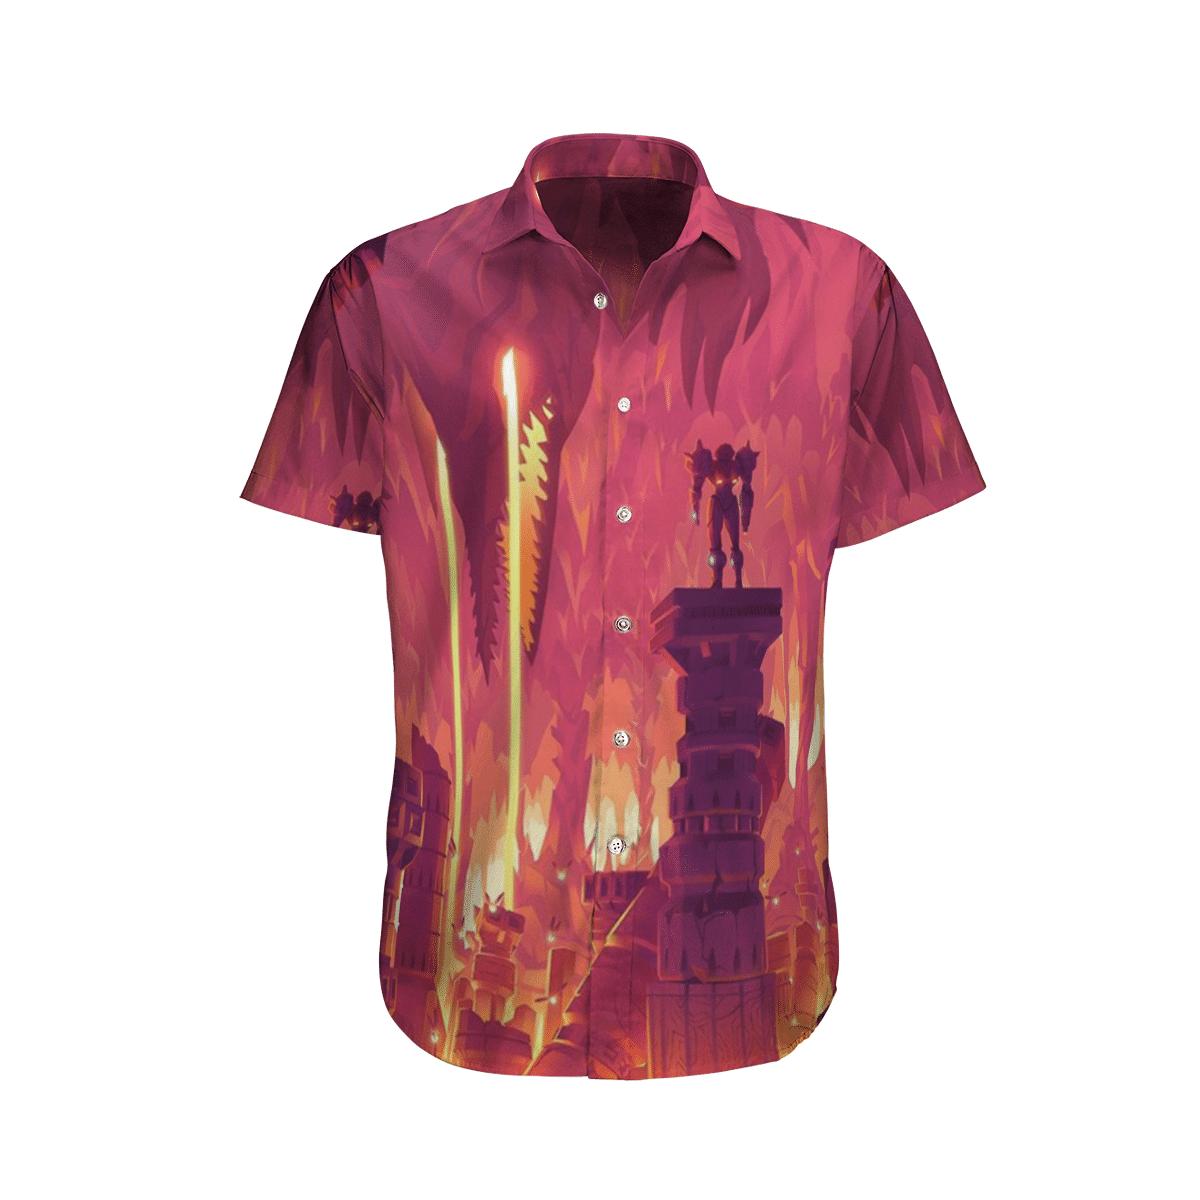 Metroid Prime Red Hawaiian Shirt